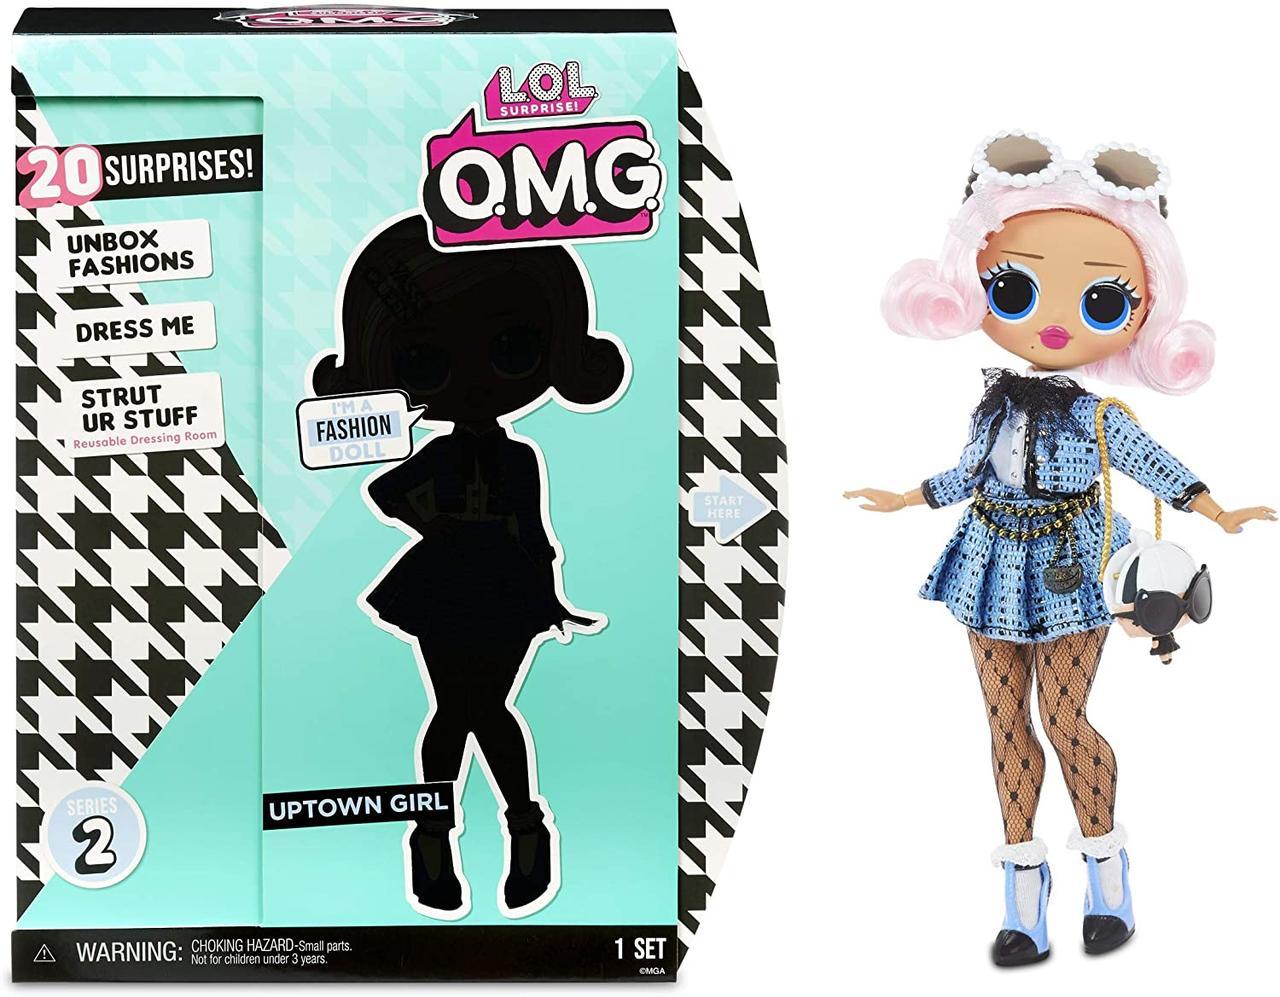 Кукла ЛОЛ ОМГ Аптаун Герл L. O. L. Surprise O. M. G. OMG 2.8-Uptown Girl LOL OMG с розовыми волосами